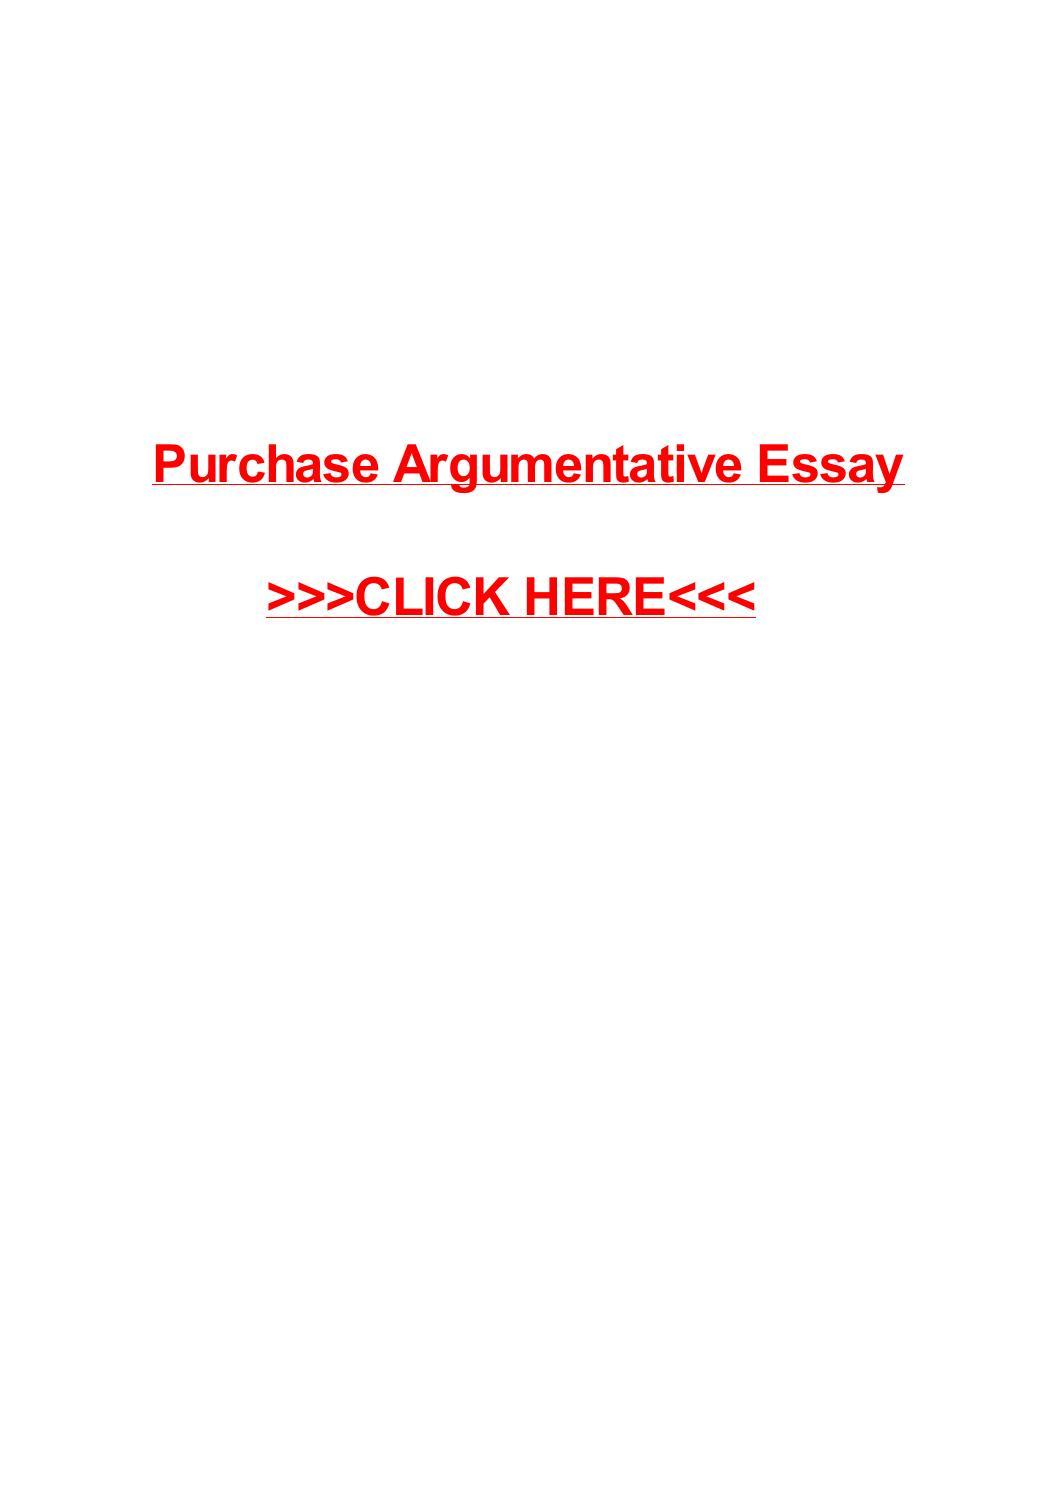 Argumentative essay purchase